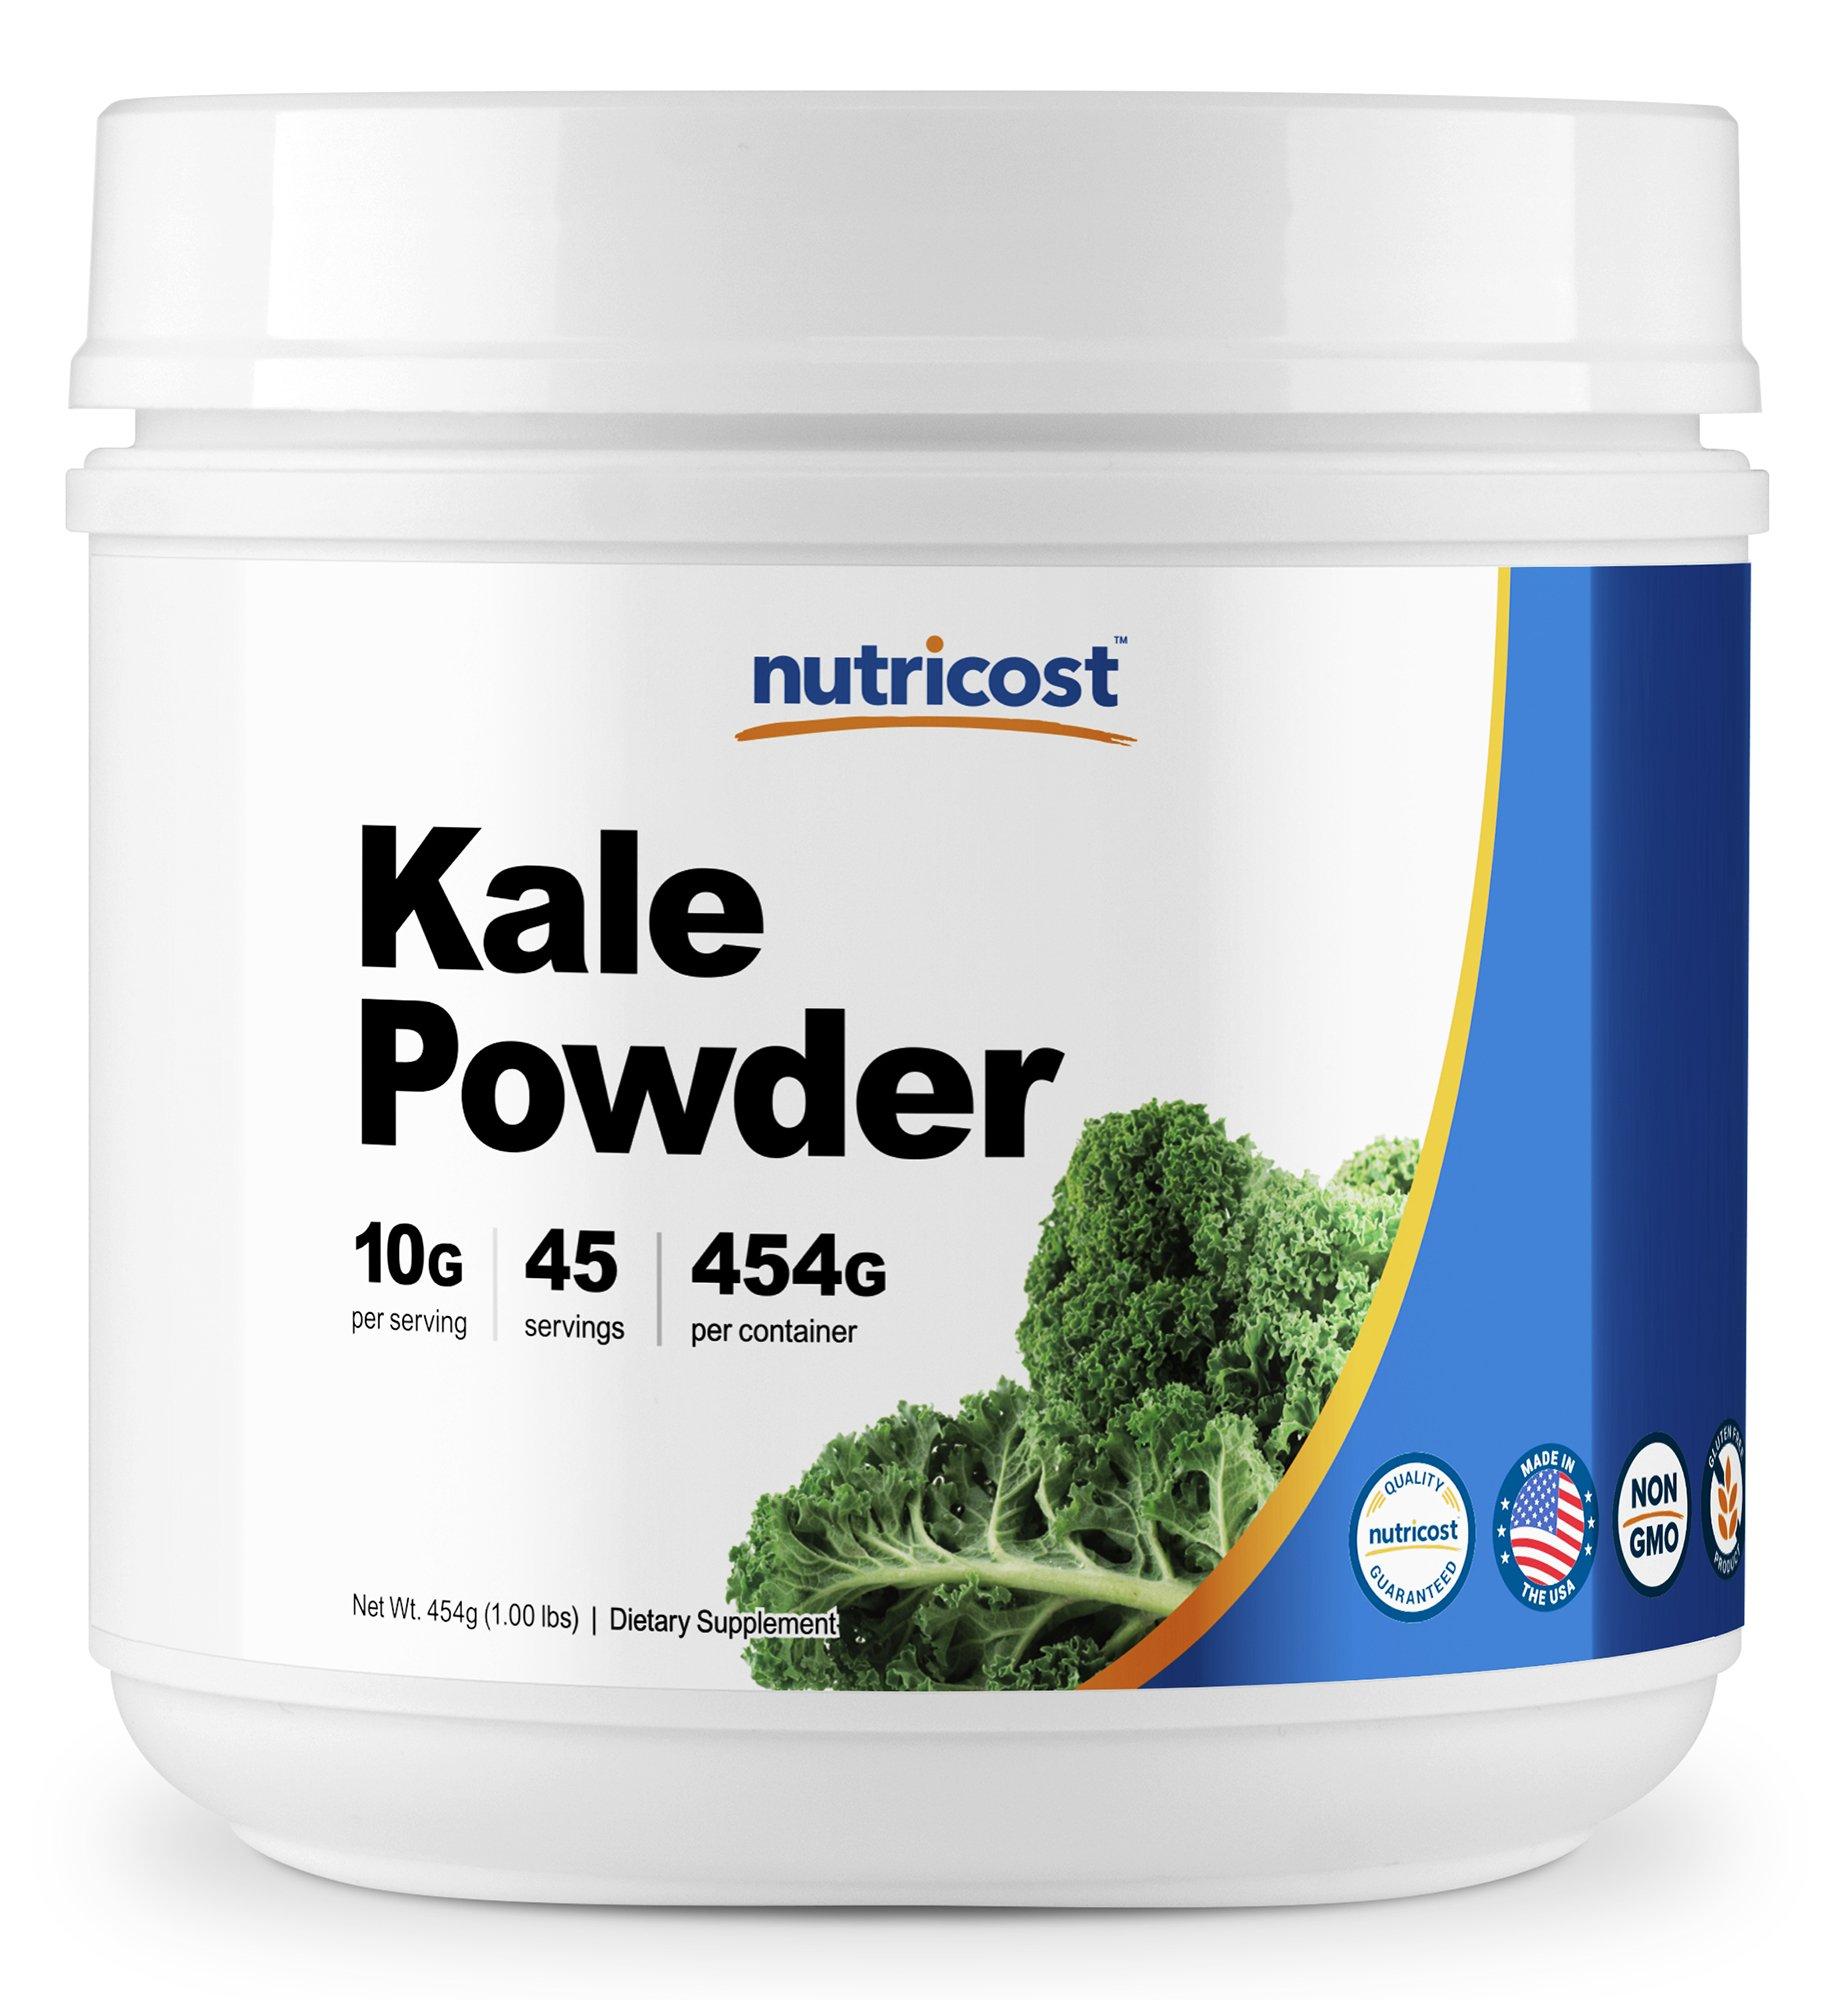 Nutricost Kale Powder 1LB - All Natural, Non-GMO, Gluten Free, Pure, Premium Kale by Nutricost